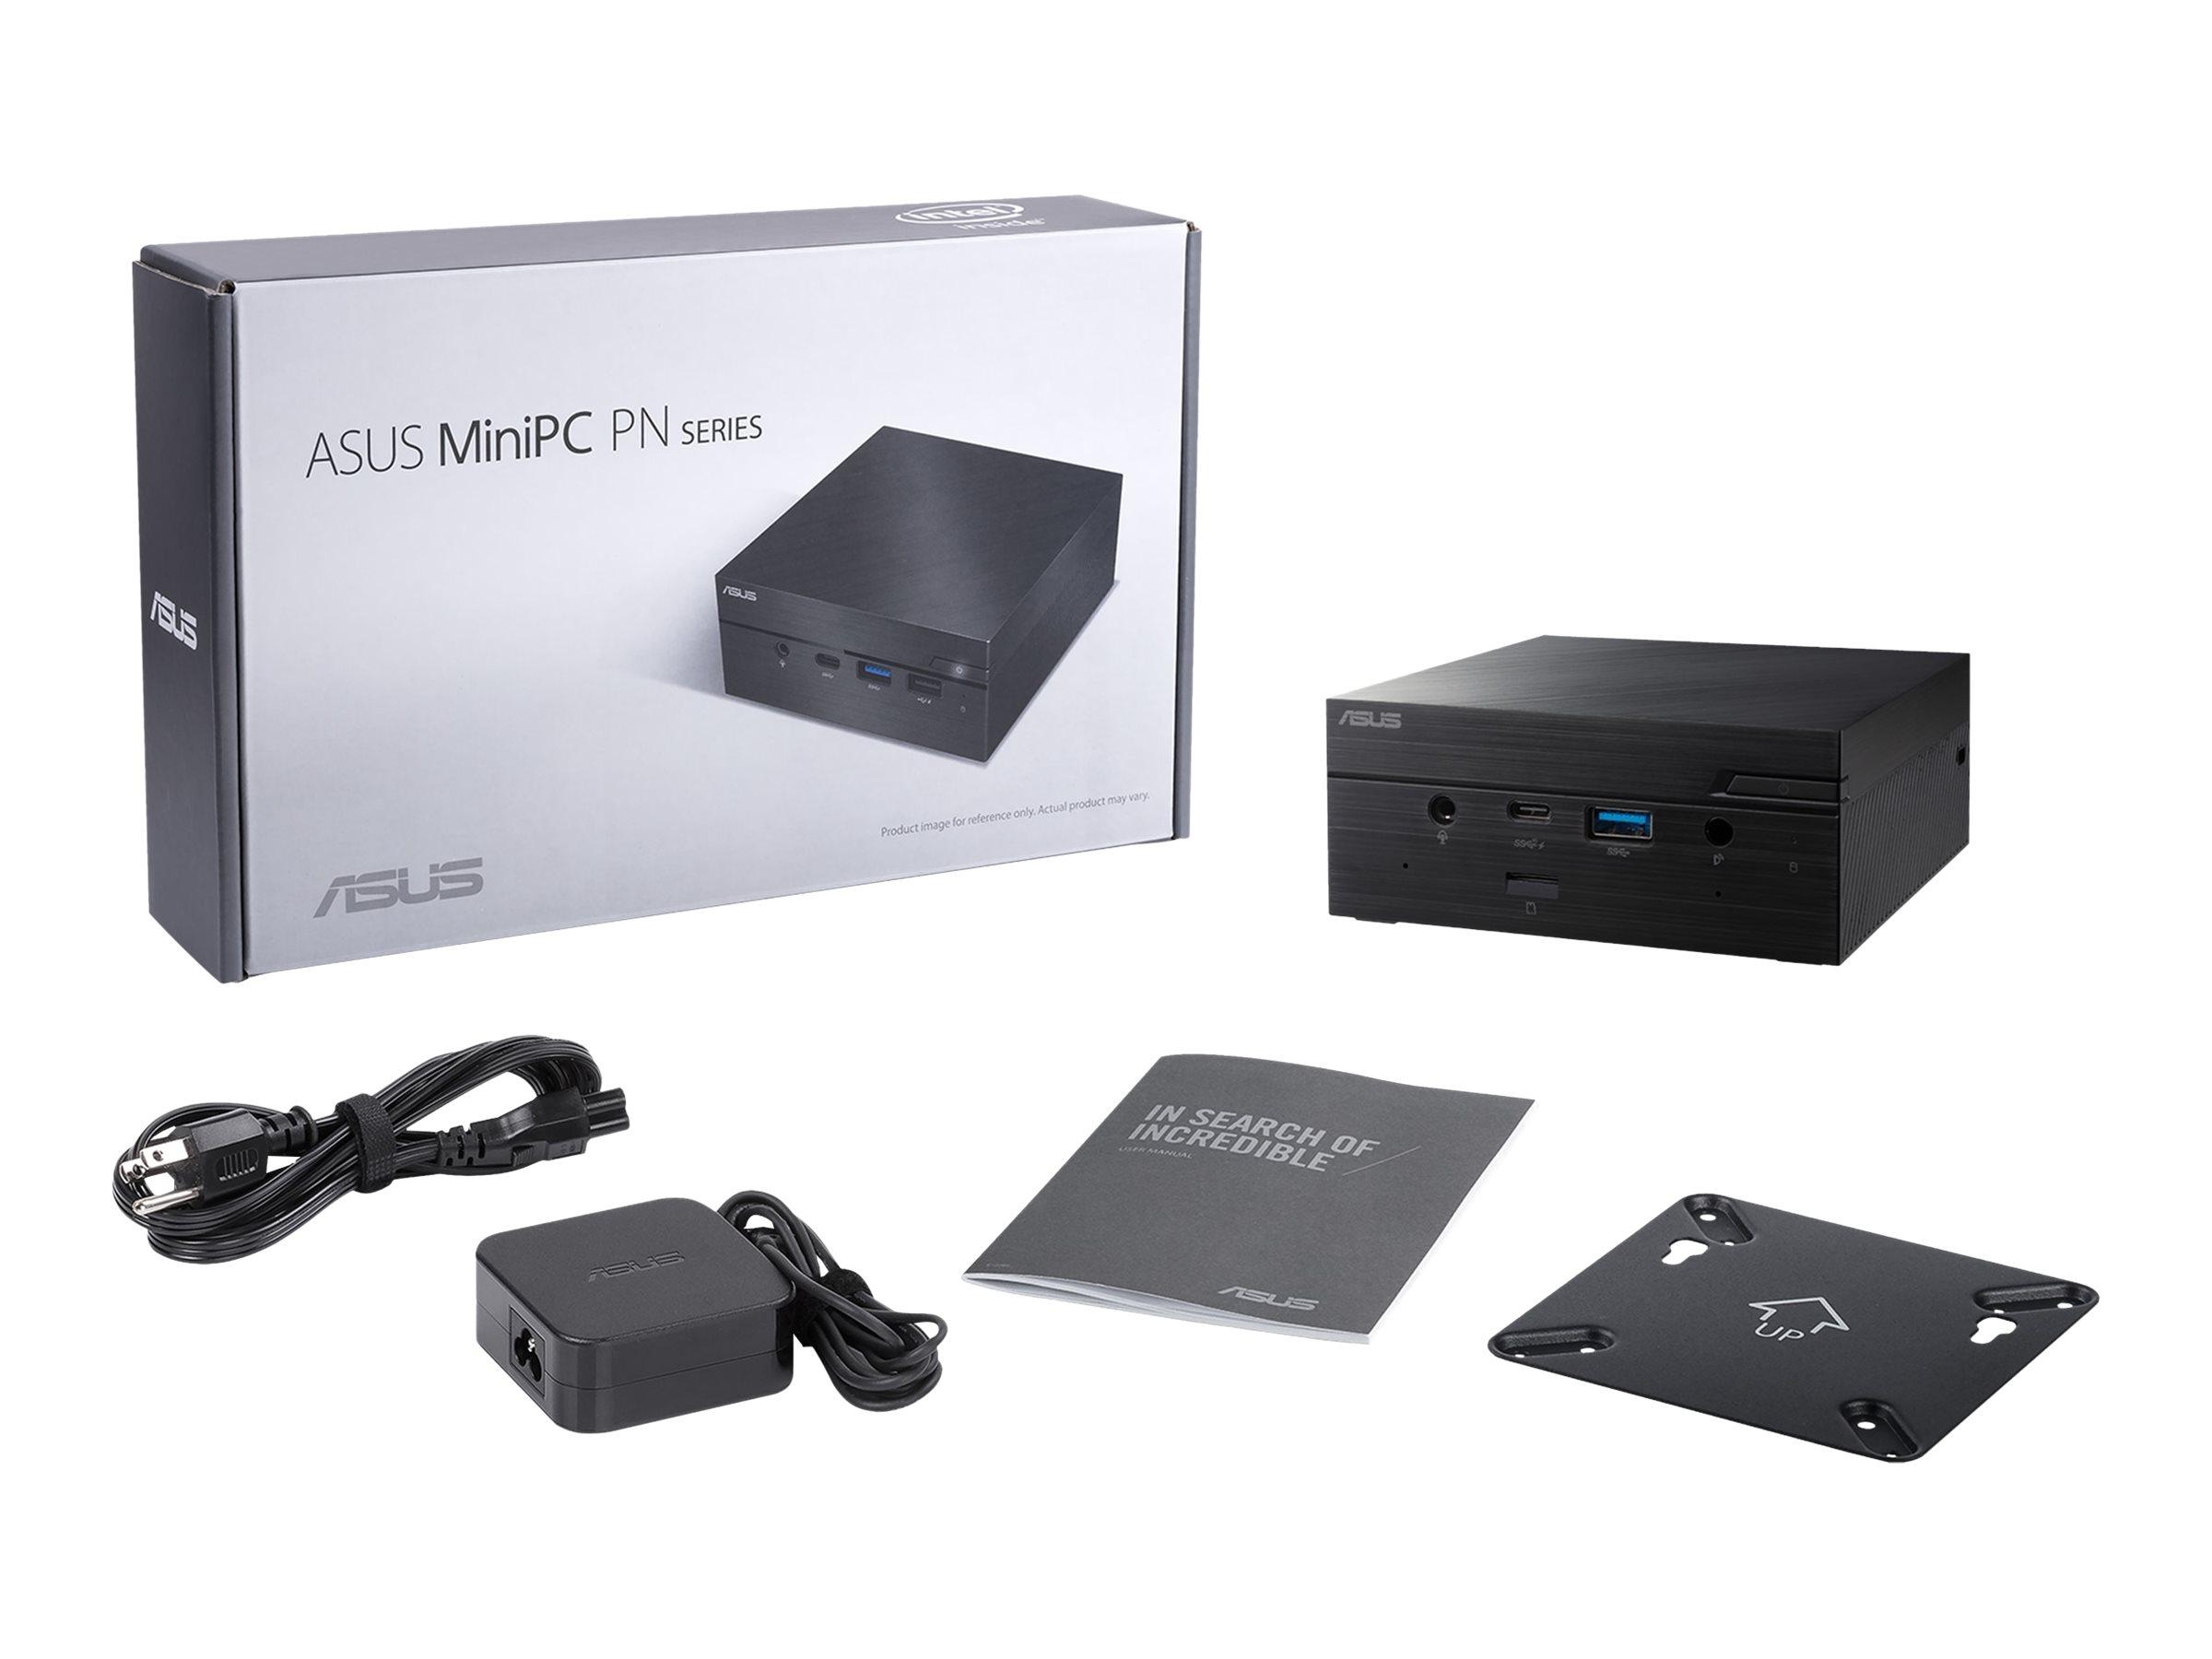 Vorschau: ASUS Mini PC PN62 BB7005MD - Barebone - Mini-PC